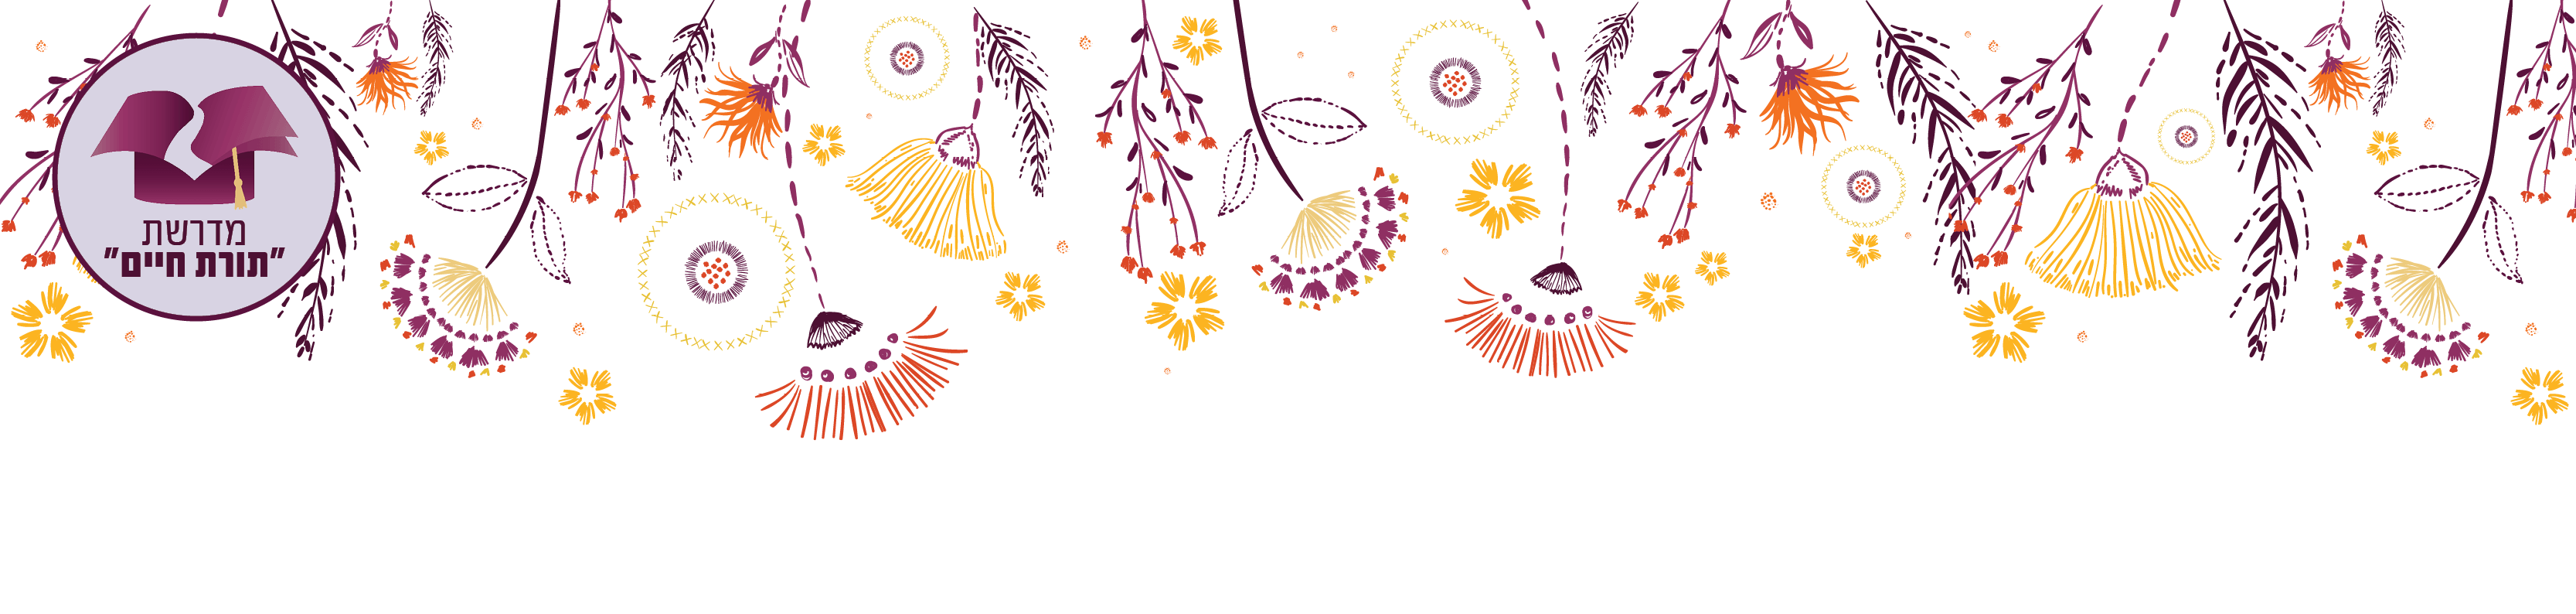 קאבררר